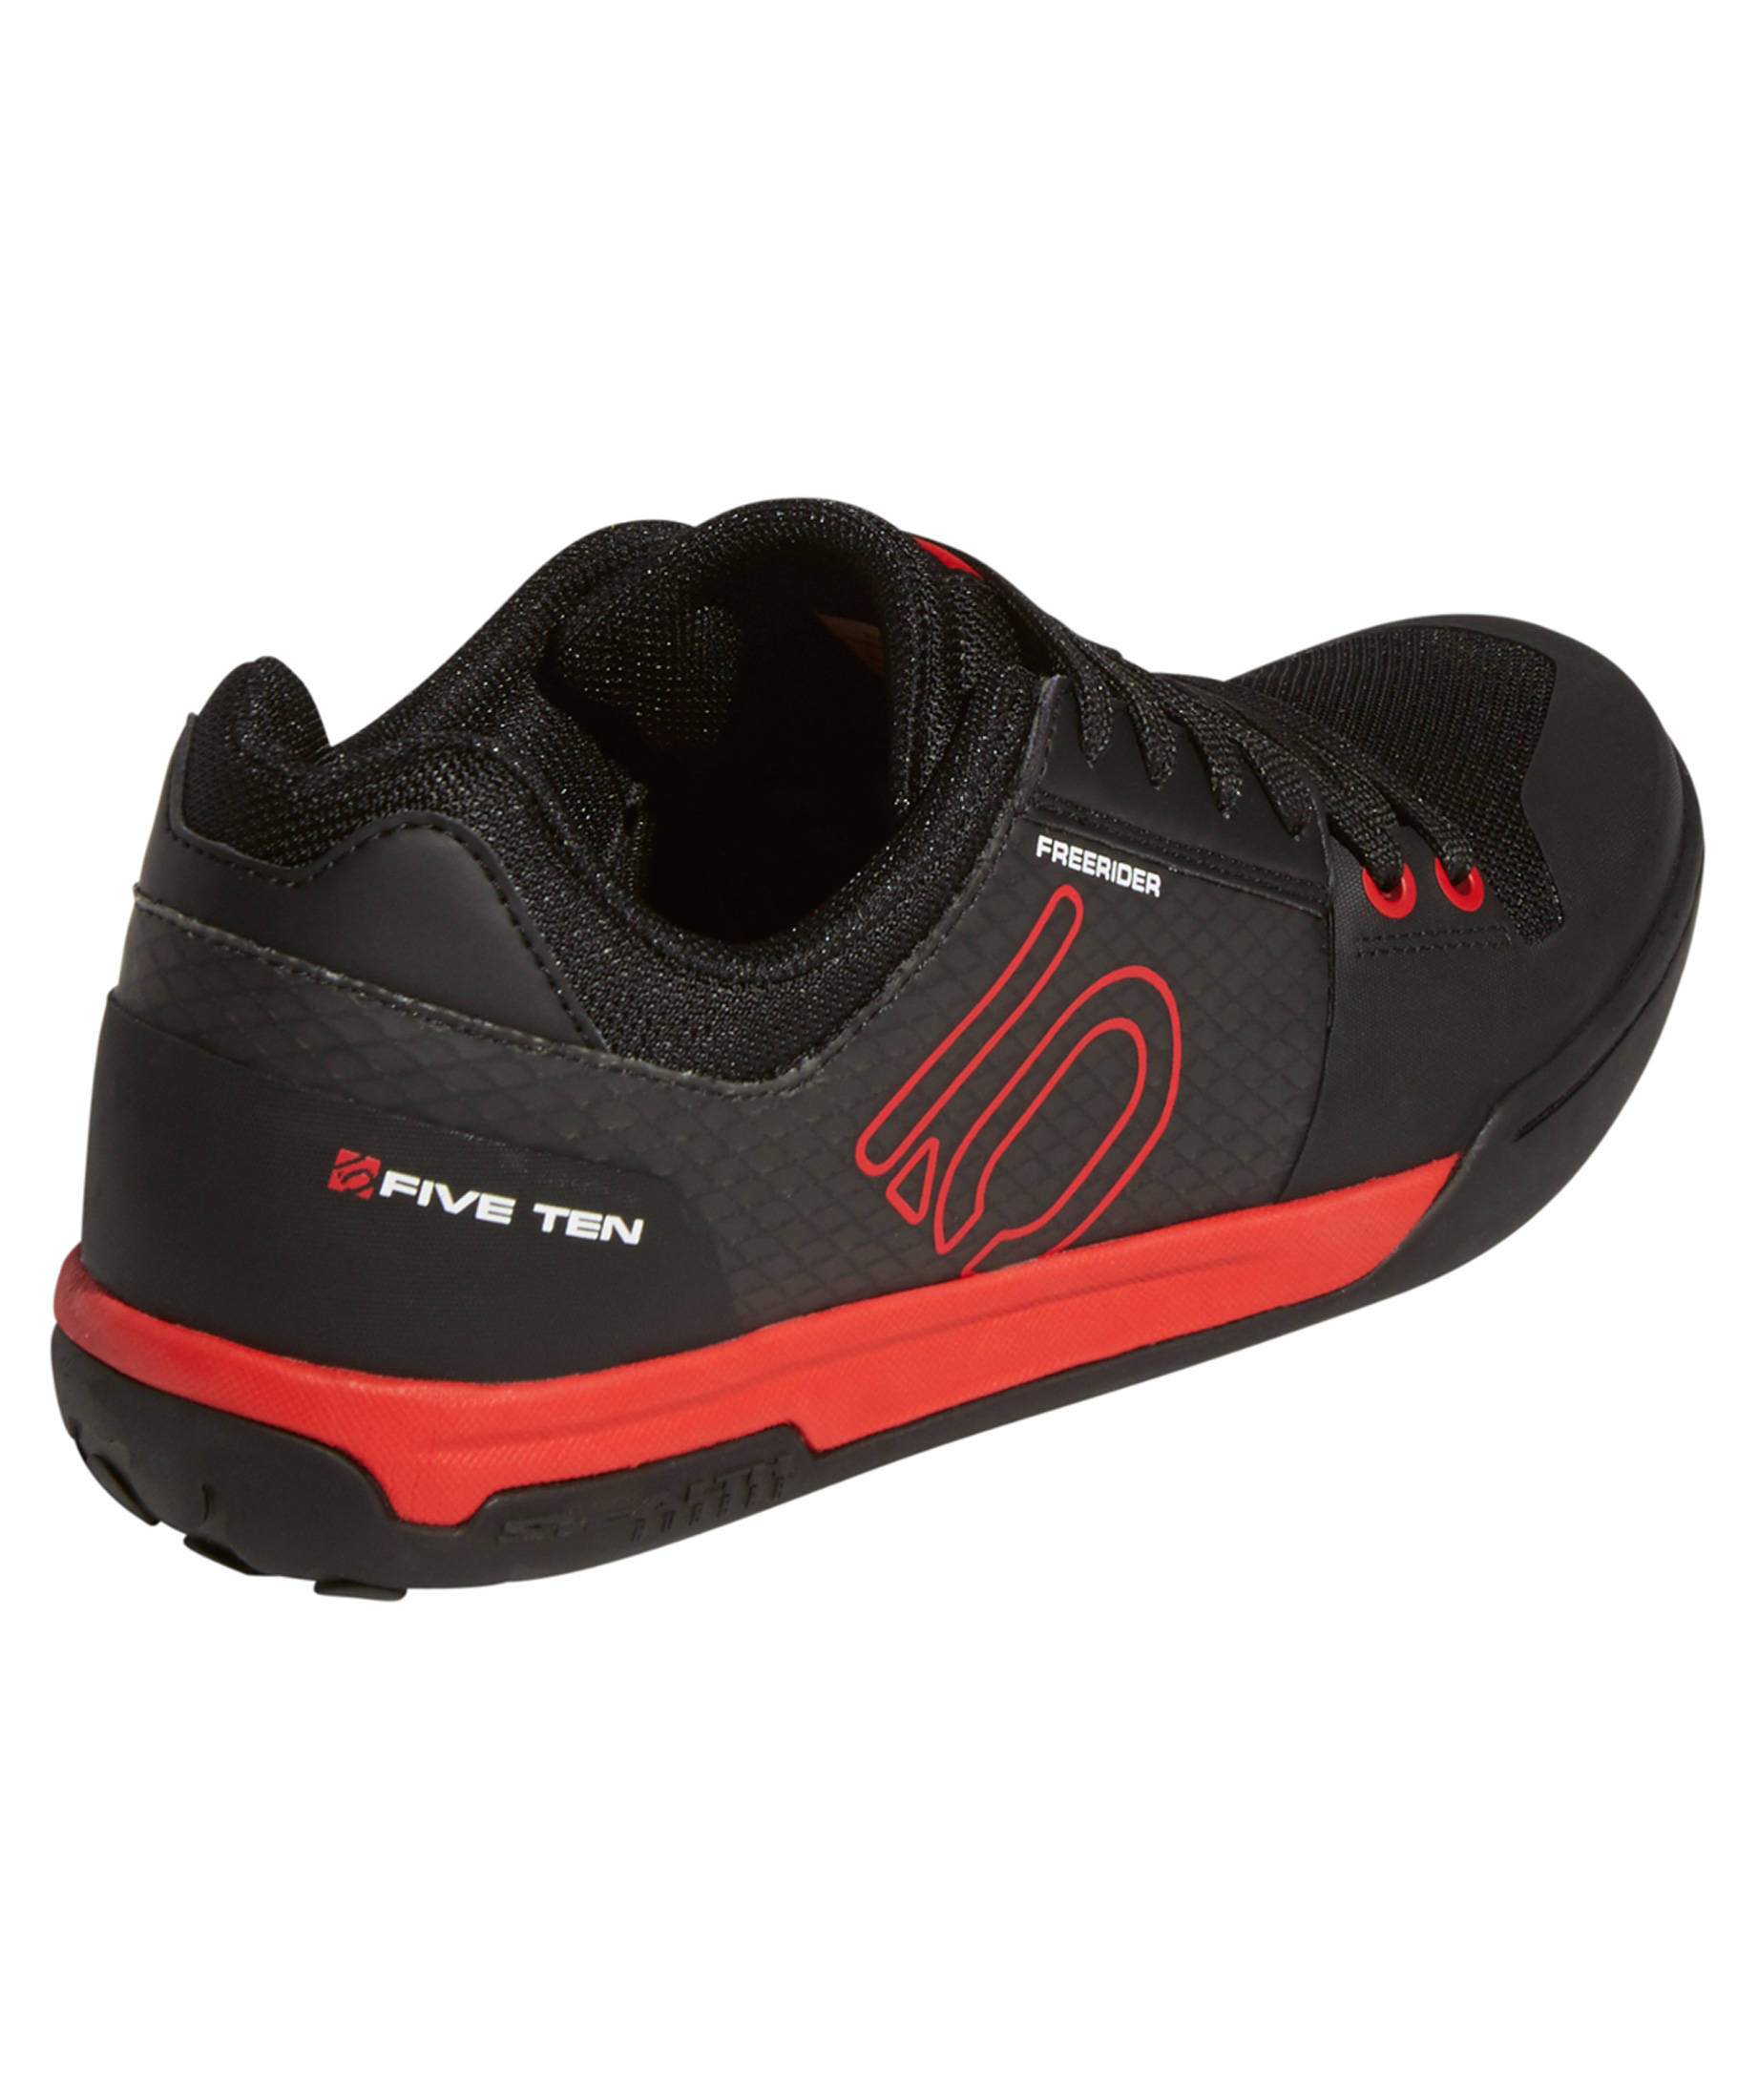 ADIDAS PERFORMANCE HERREN Mountainbike Schuhe